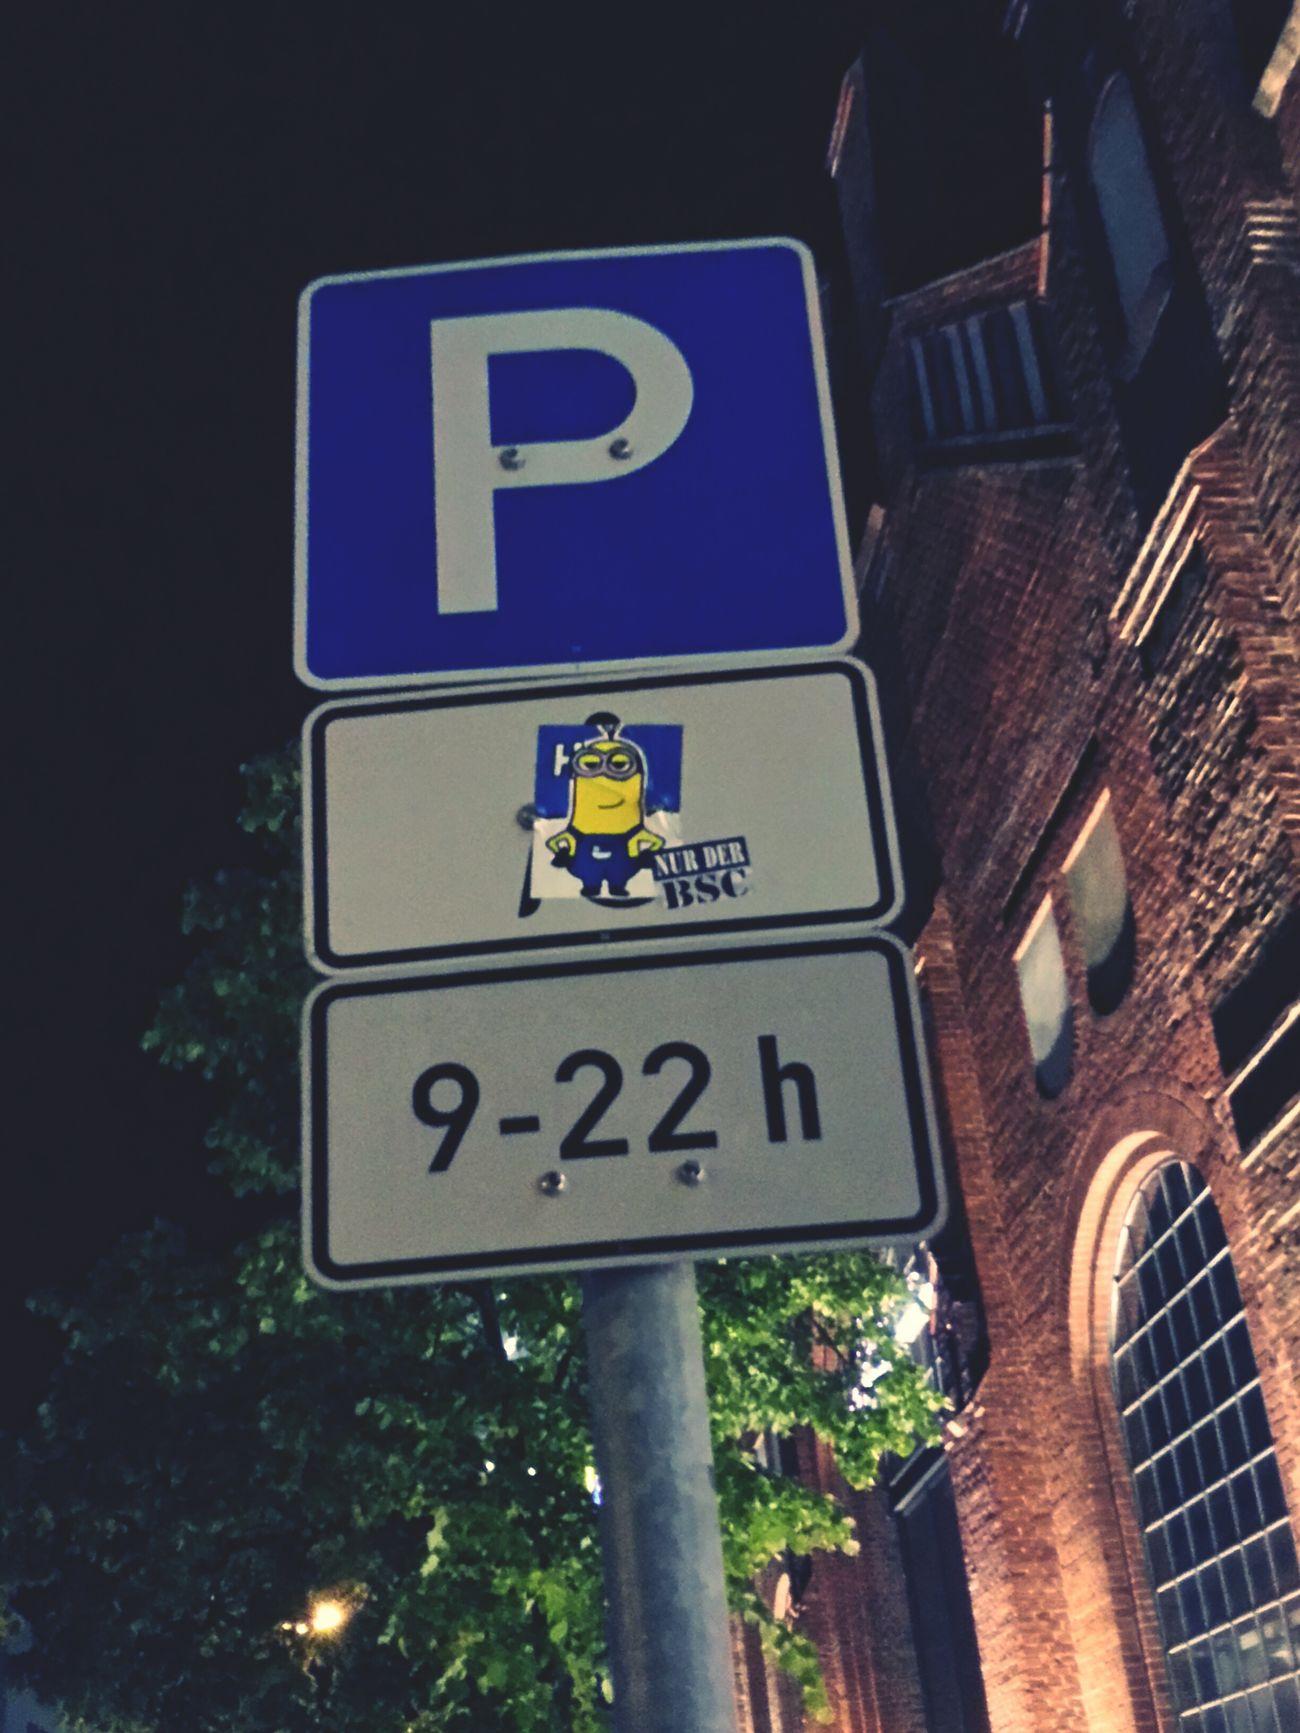 MiNiONS PARKiNG ONLY! Minions Parking Lot Parkingarea Hertha Borsighallen Berlin Reinickendorf Streetart Sticker Stickerart Stickerwars